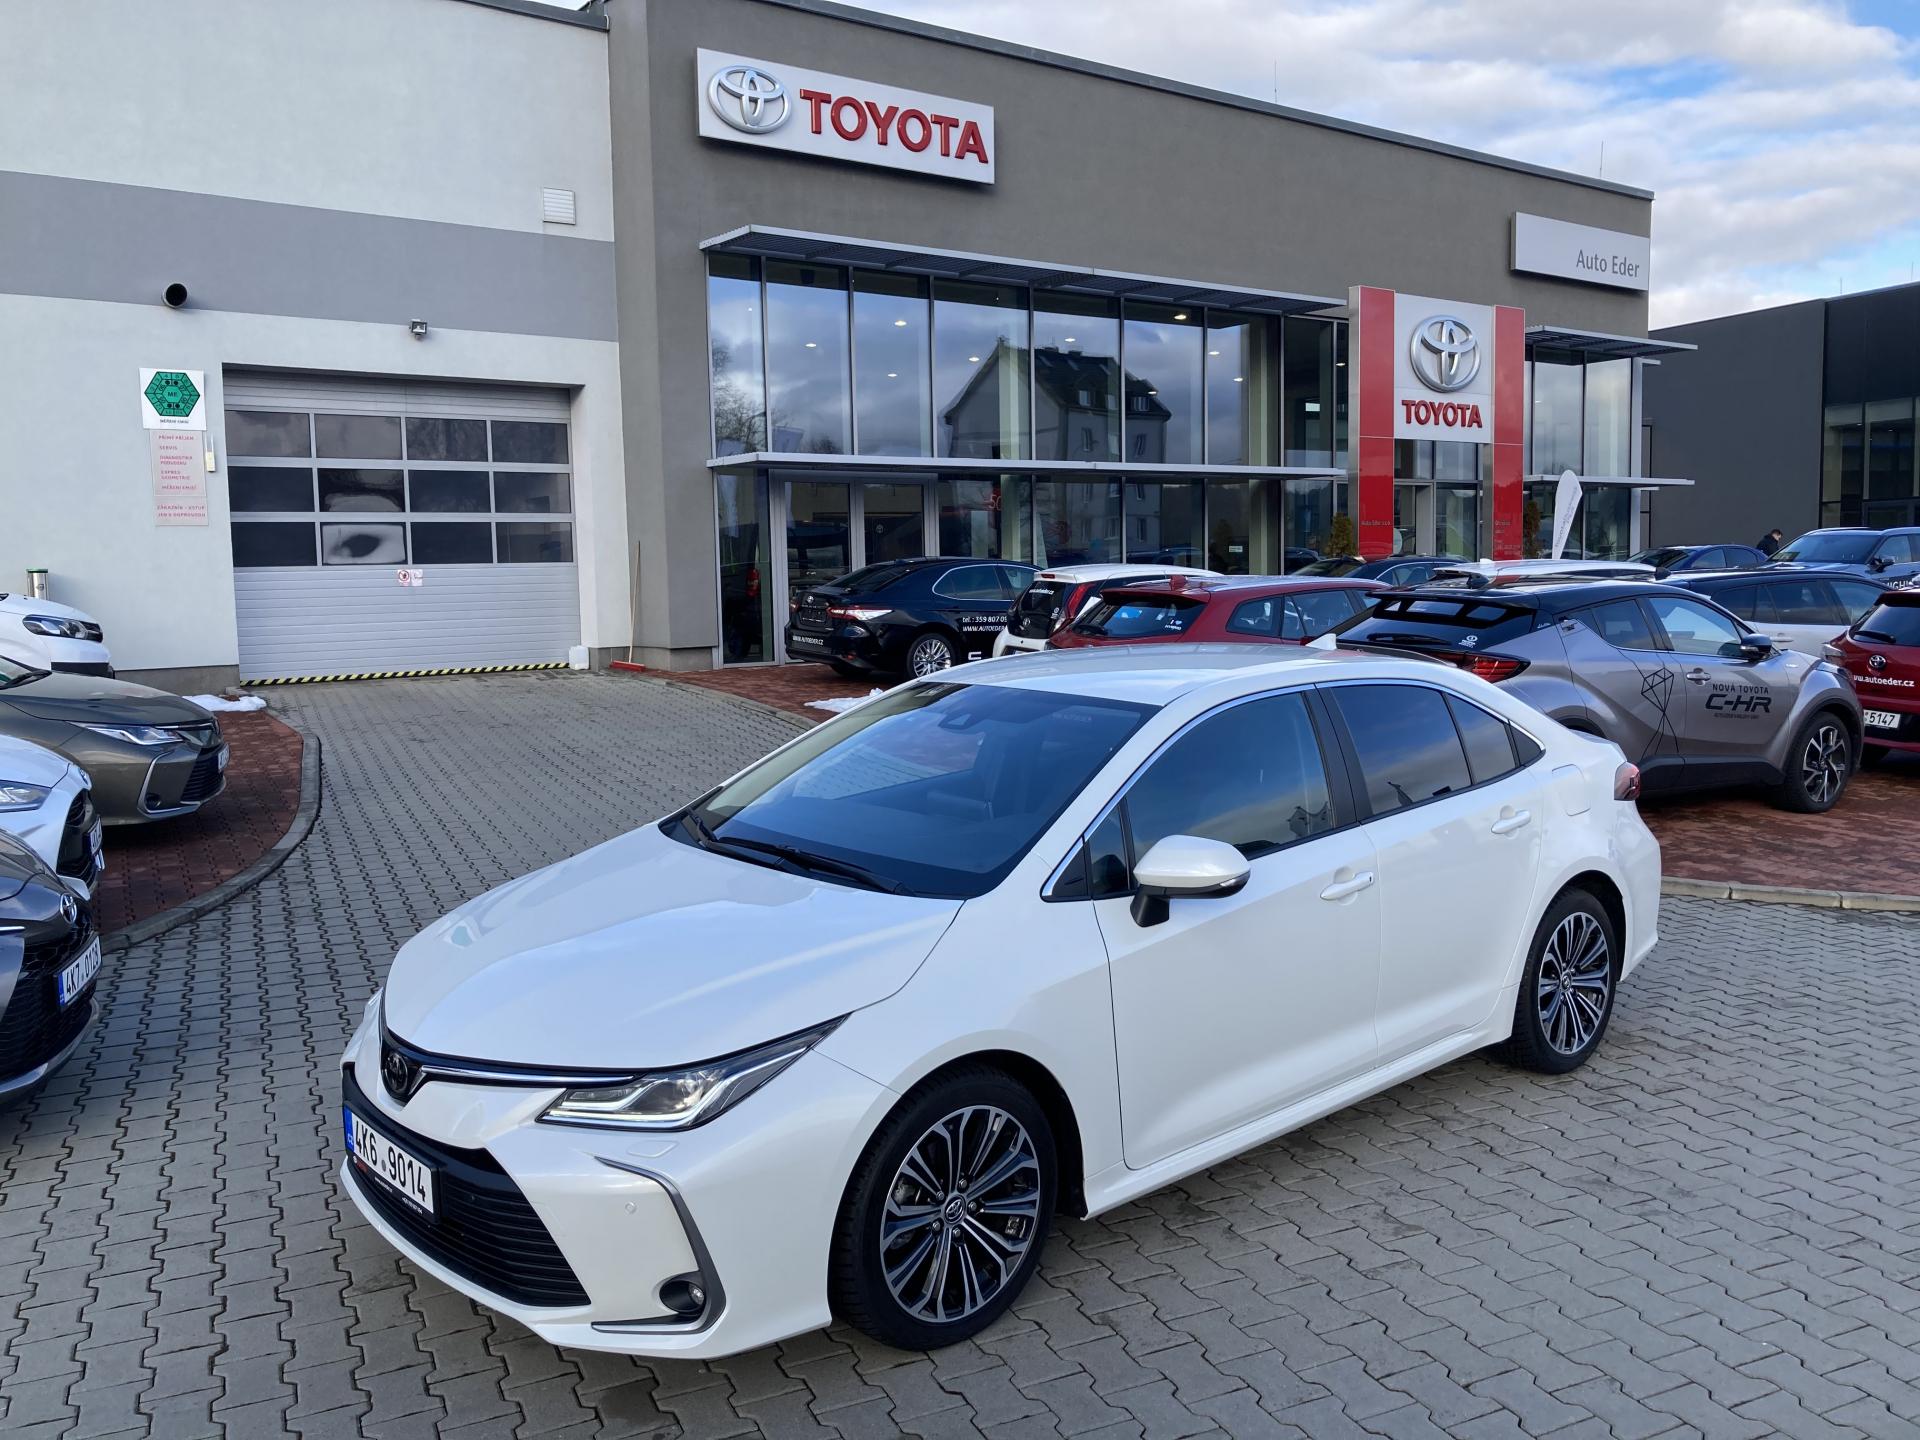 Toyota COROLLA Sedan 1,6 (132 k) aut. převodovka CVT Comfort Style Tech